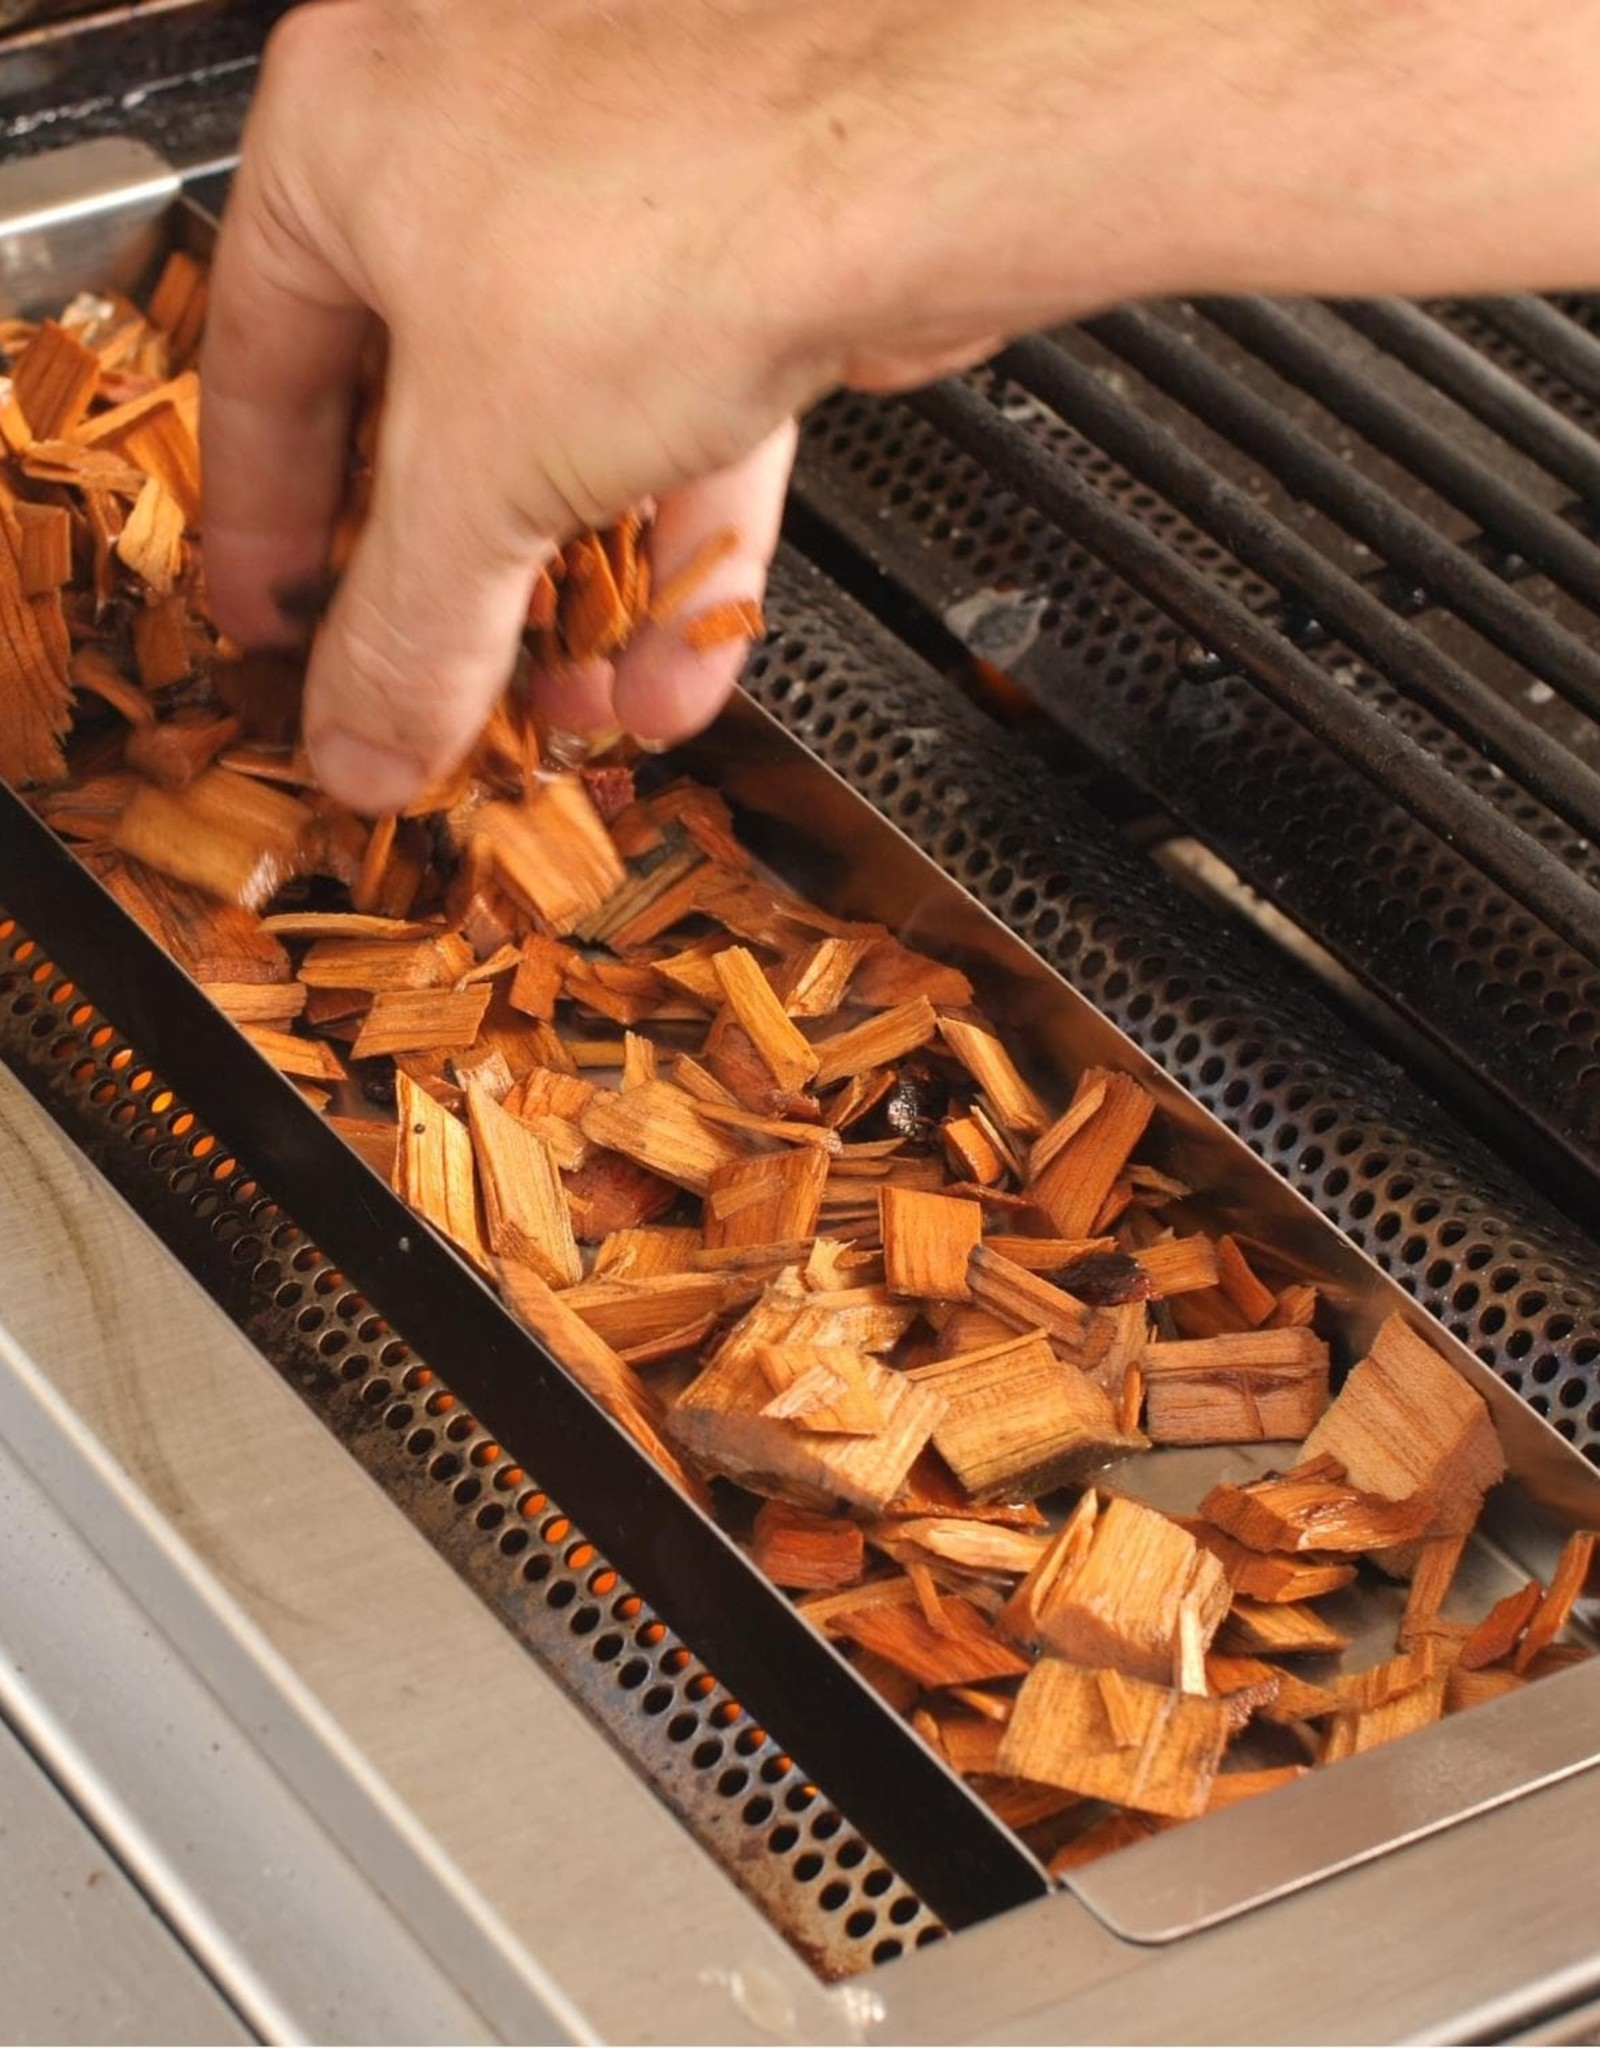 Blaze Outdoor Products Blaze Stainless Steel Smoker Box - BLZ-SMBX